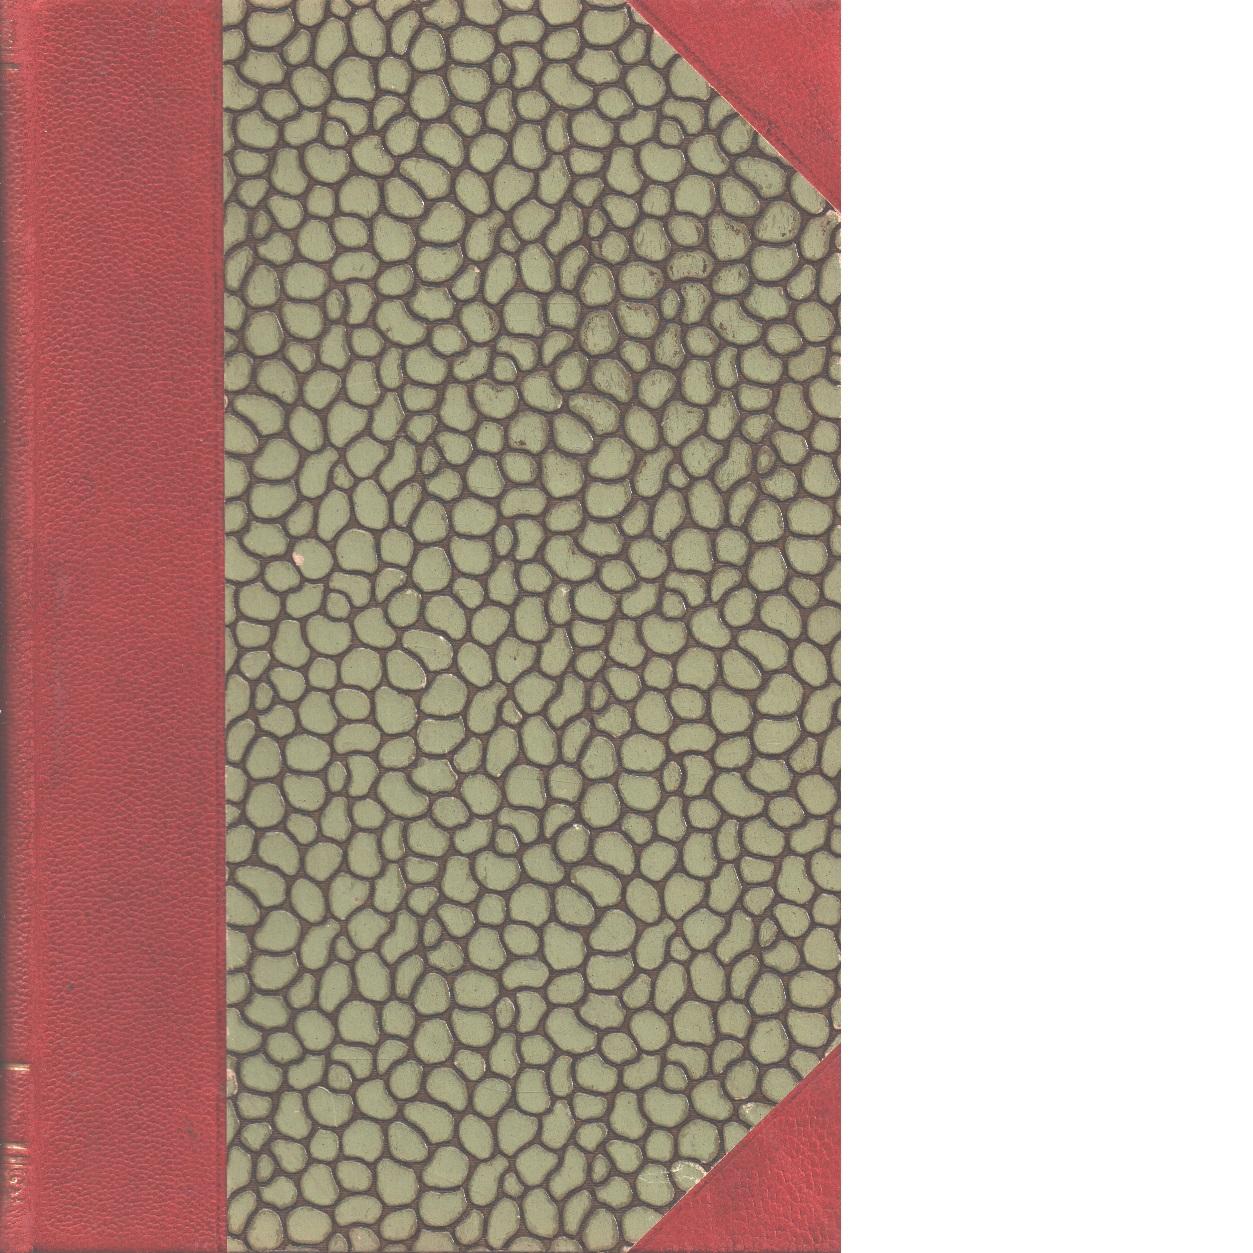 STF:s årsskrift 1919 - Red.